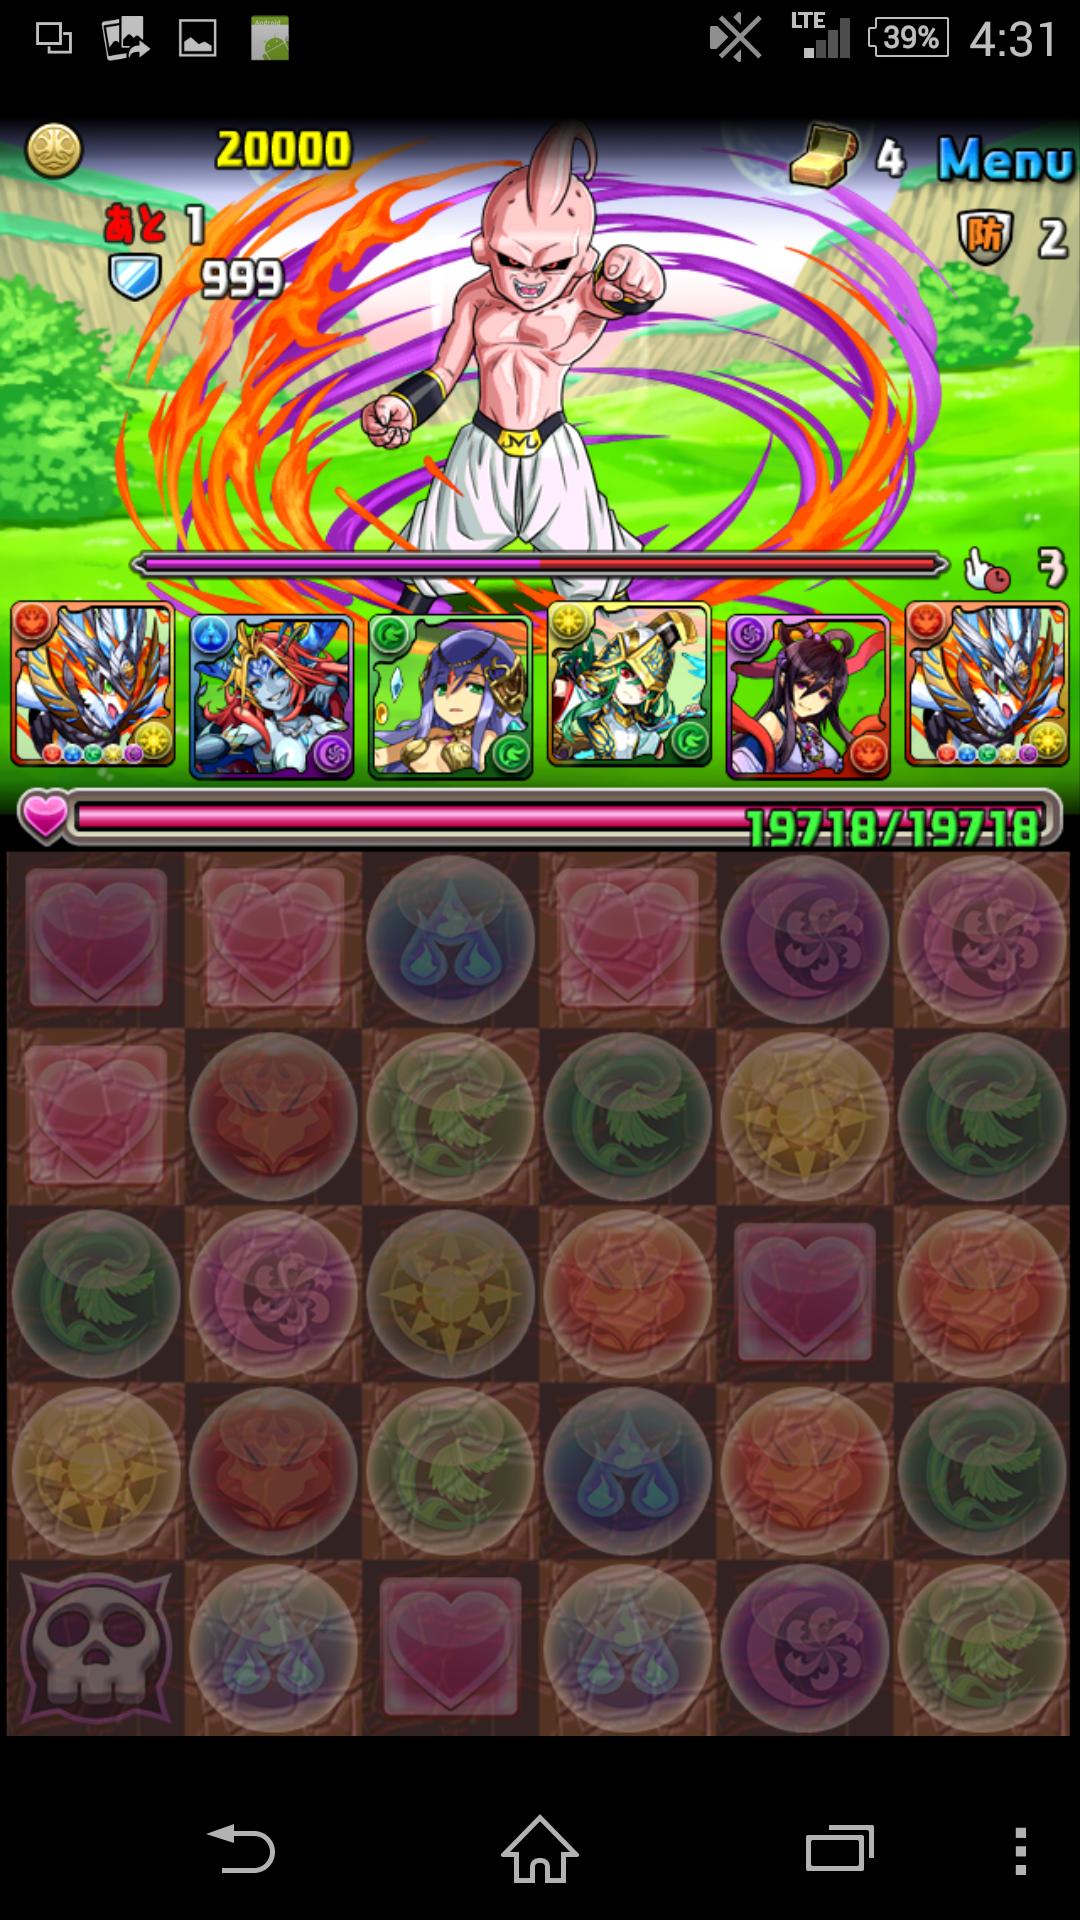 Screenshot_2014-09-24-04-31-28.png